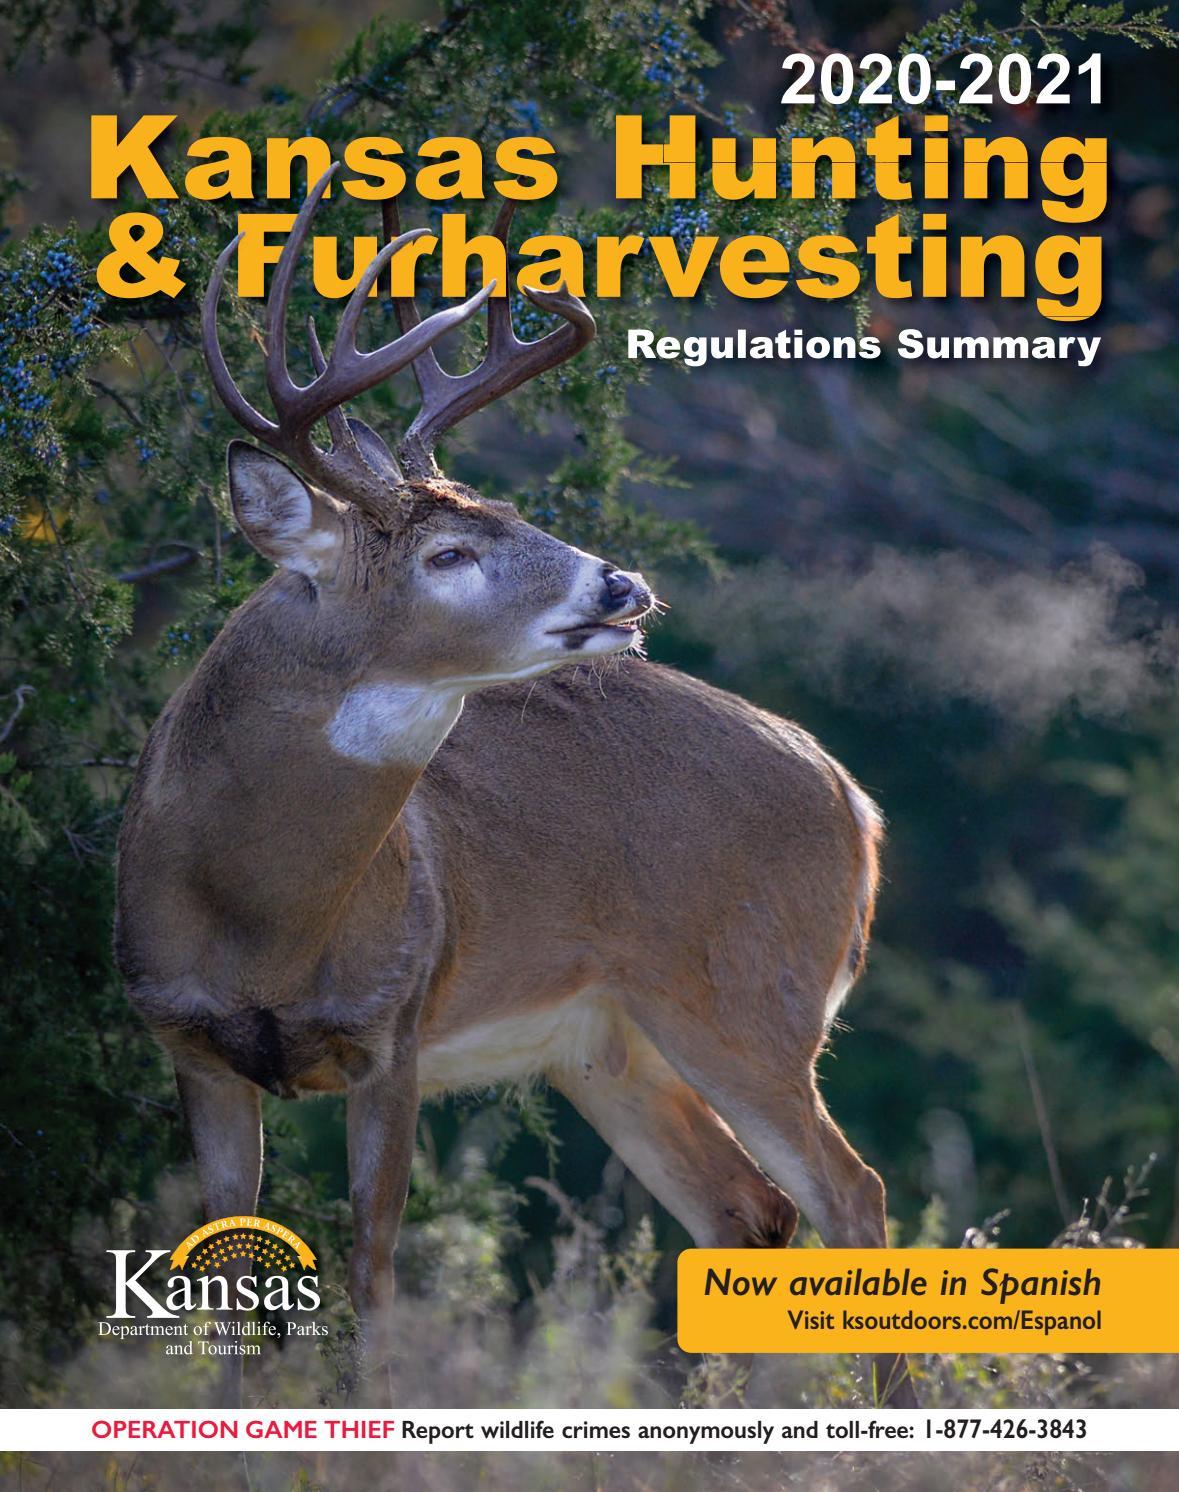 2020-2021 Kansas Hunting & Furharvesting Regulations Summary with regard to 2021 Deer Rut